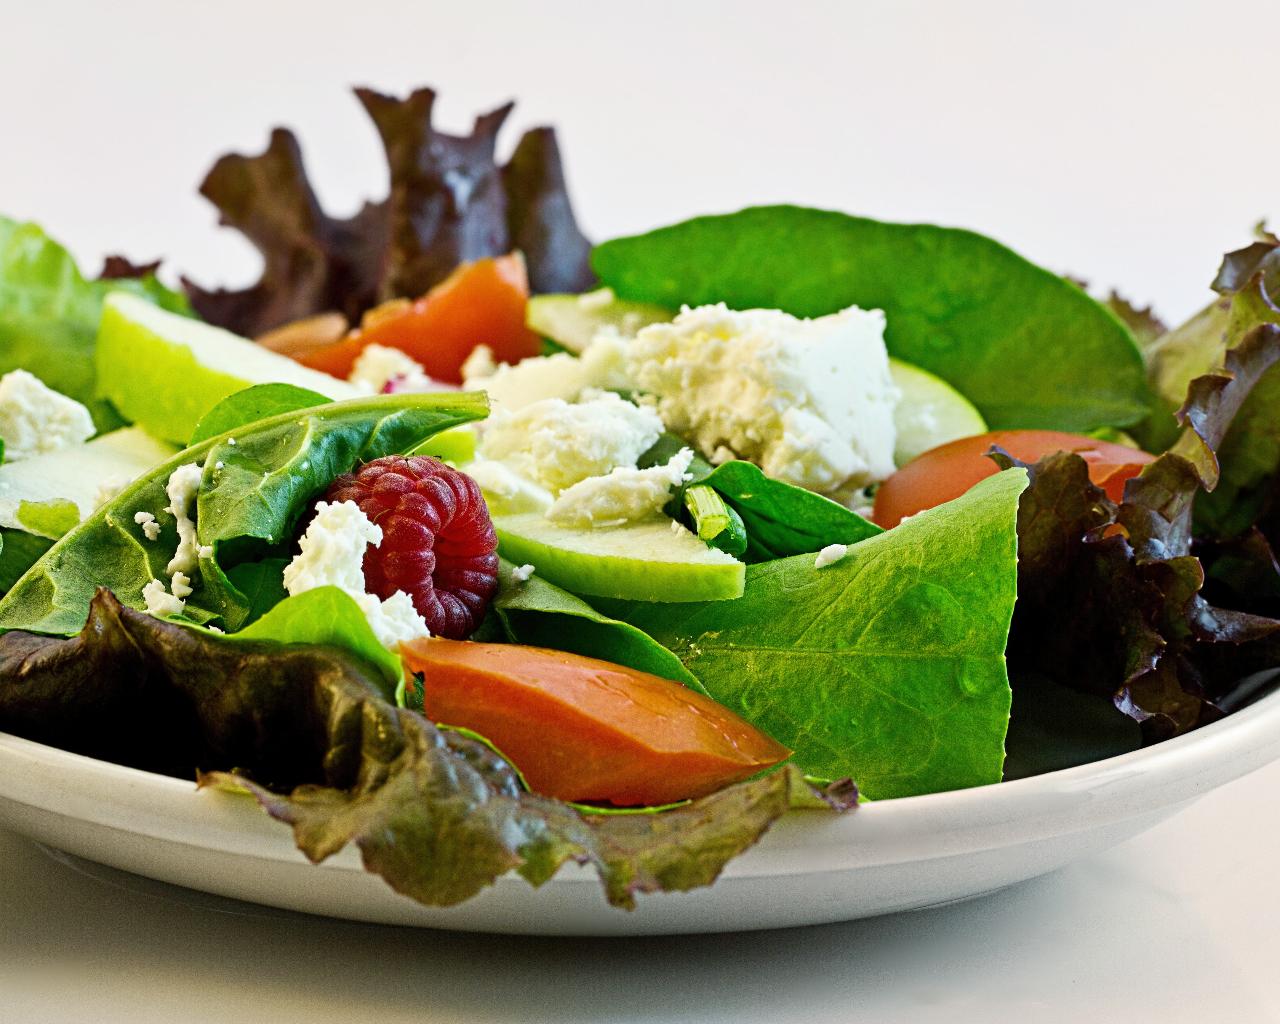 Keto Diet Vegetable Salad Plate